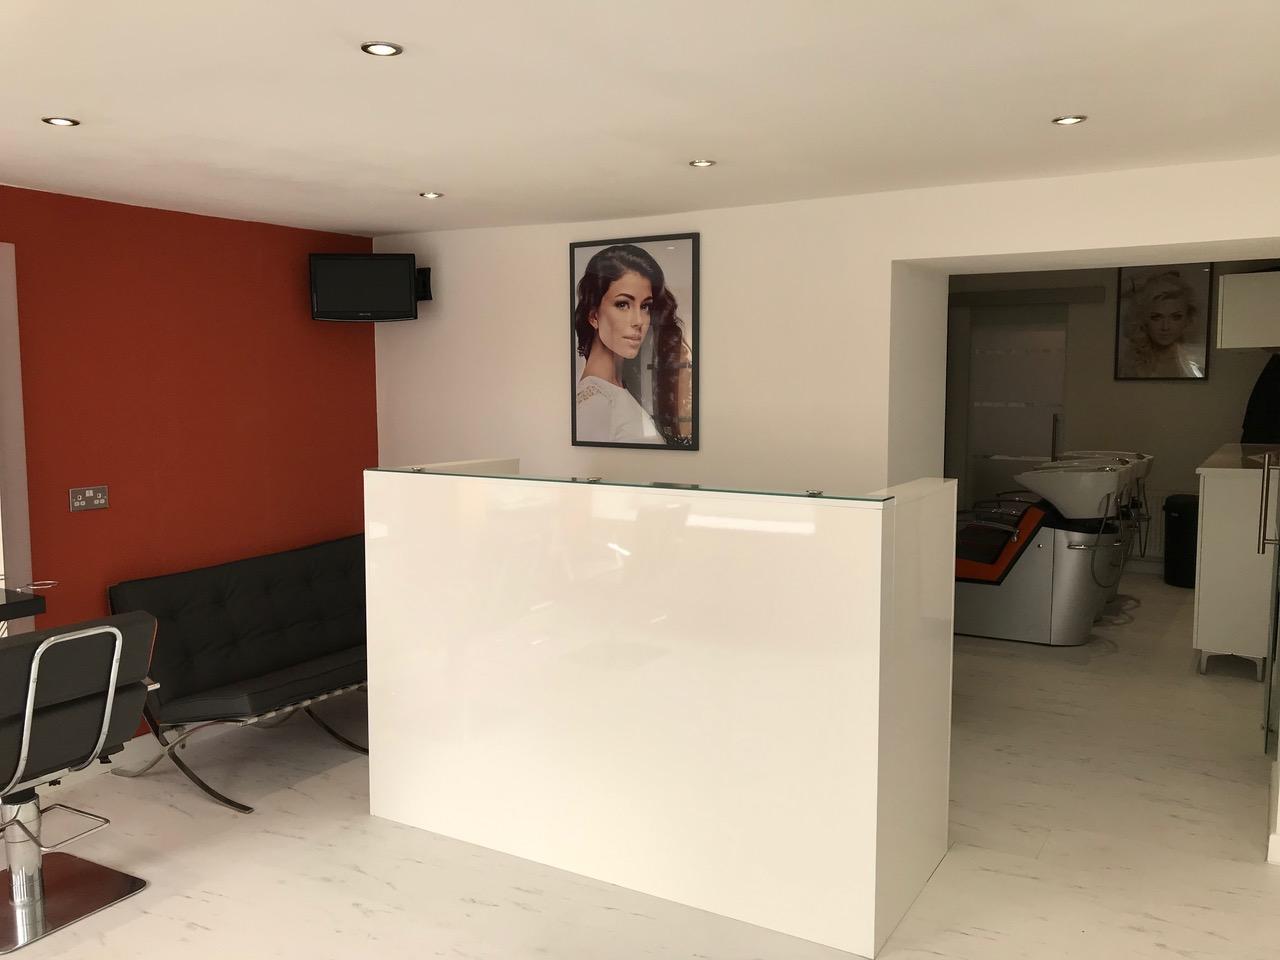 The Salon Sherburn Contact Us page image no.1